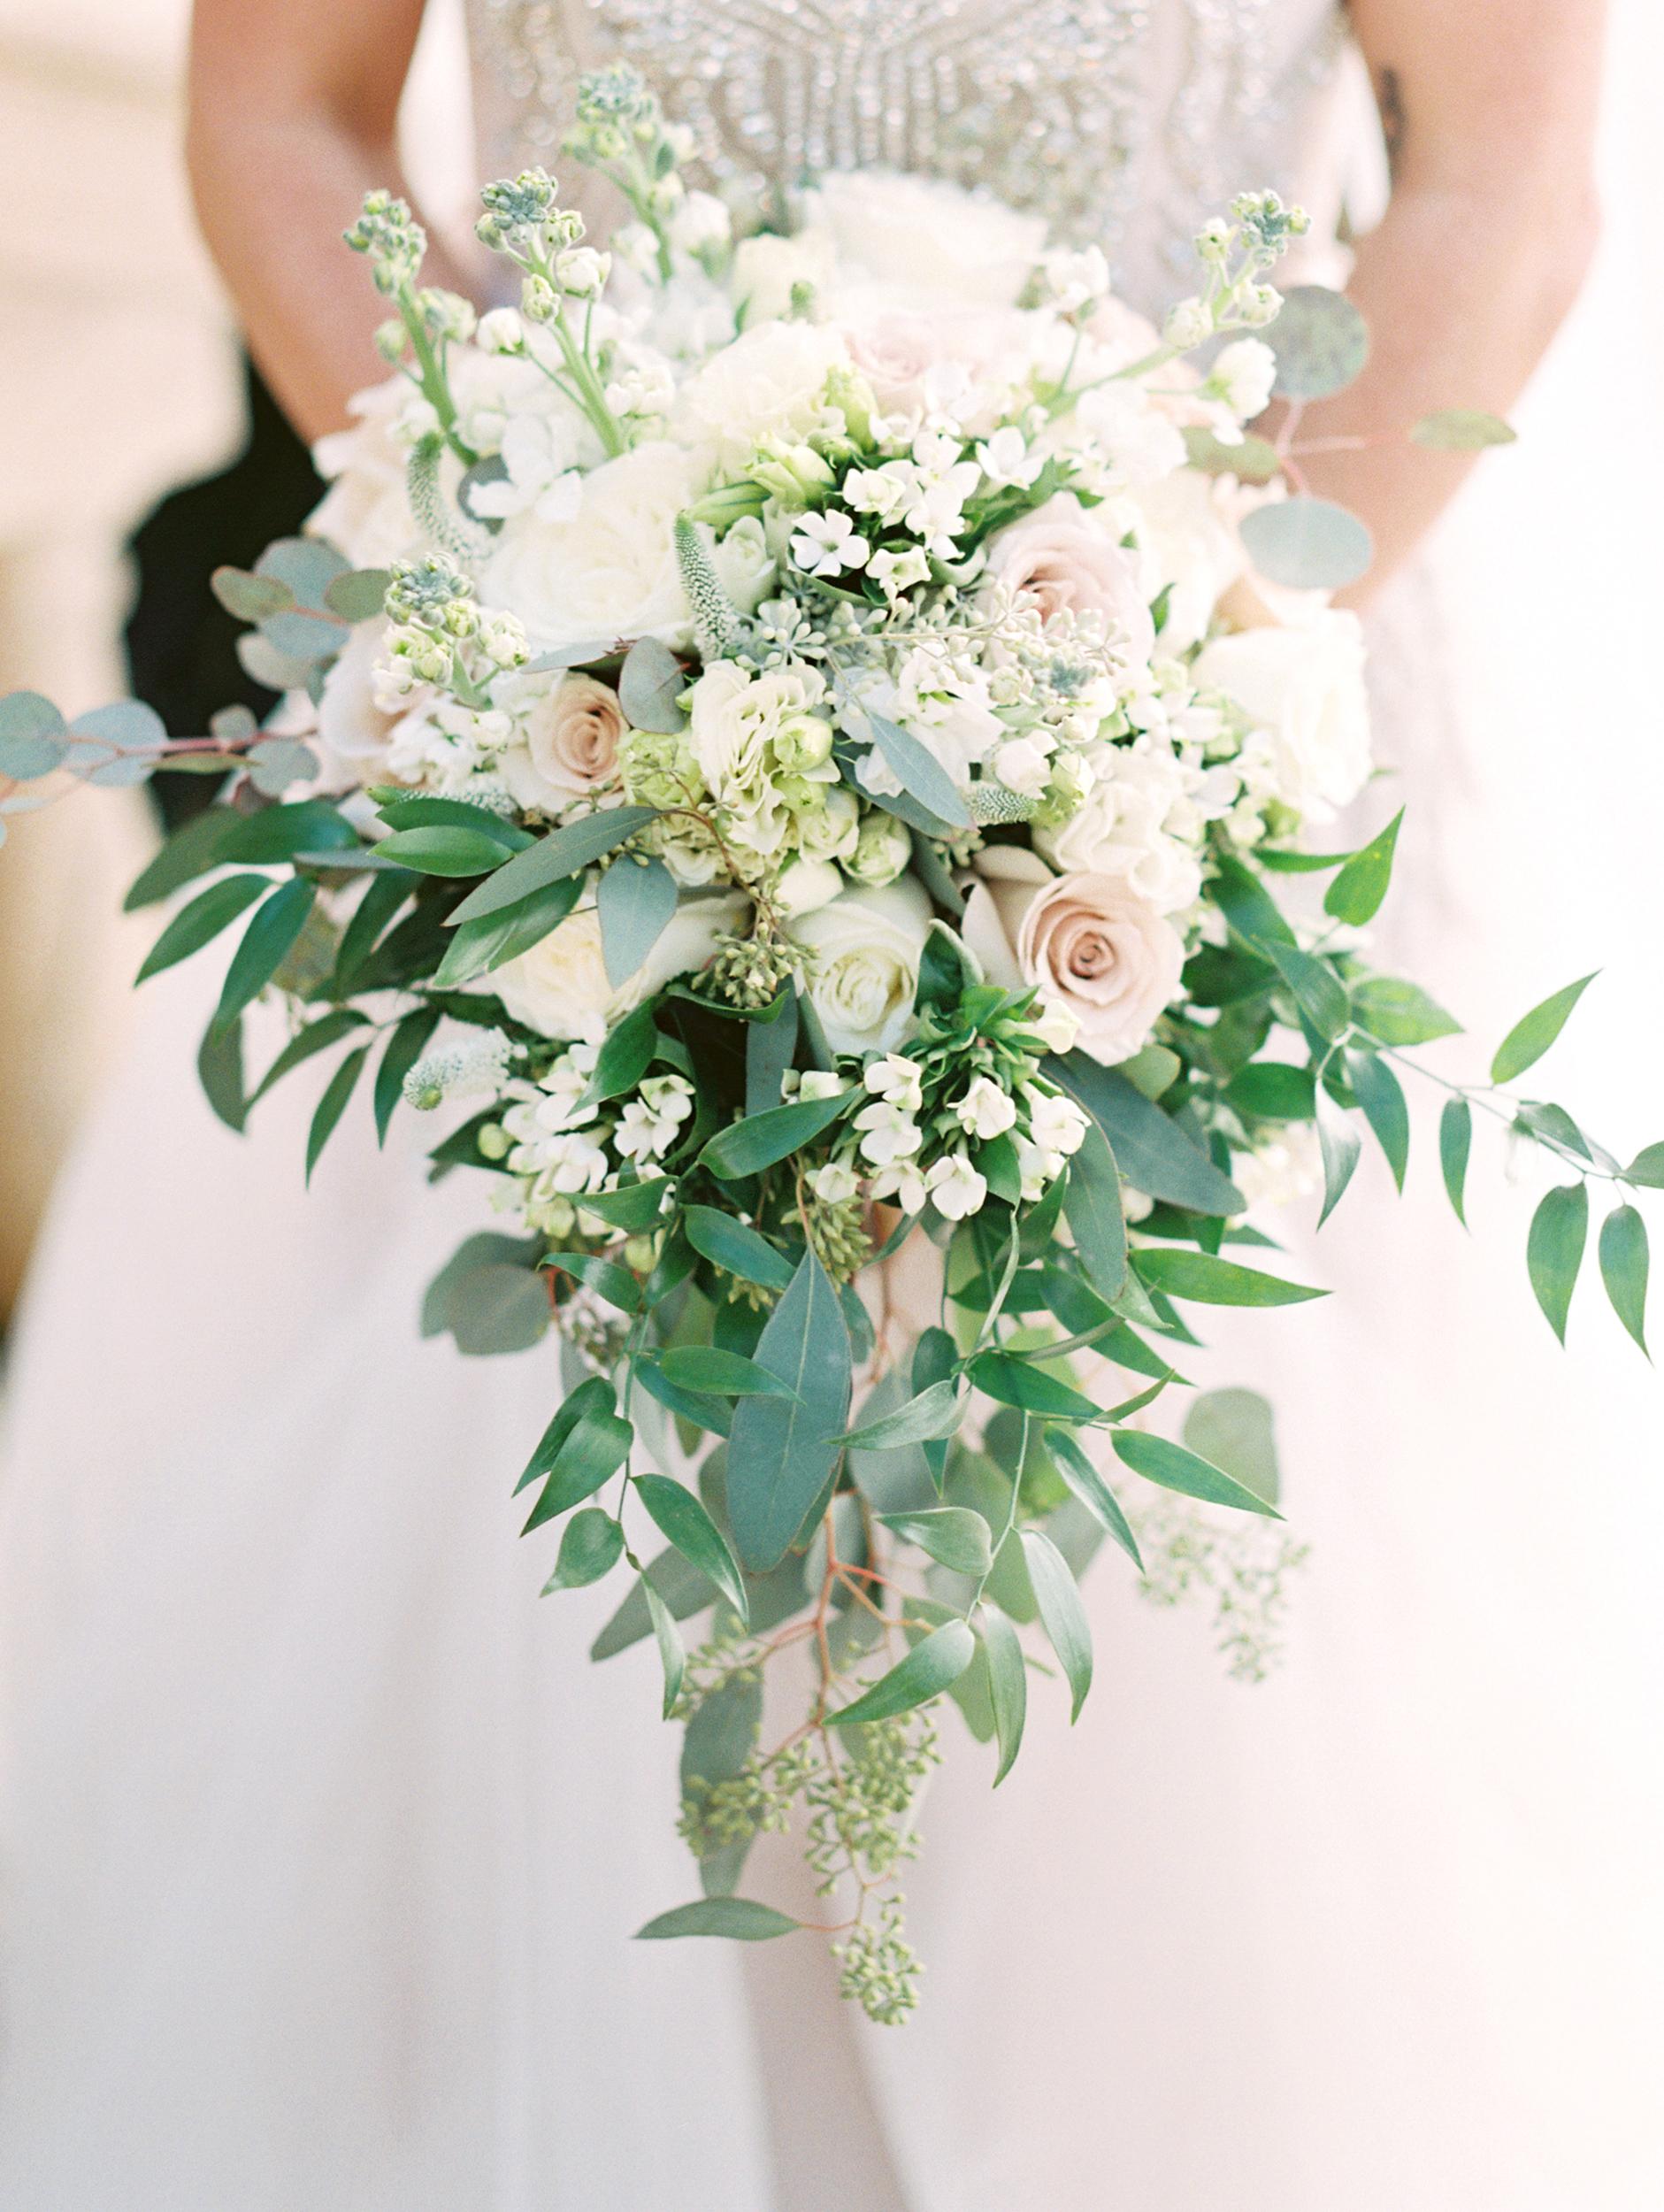 Lisa Silva Photography- Jacksonville, Florida Fine Art Film Wedding Photography Epping Forrest Yacht Club 12.jpg